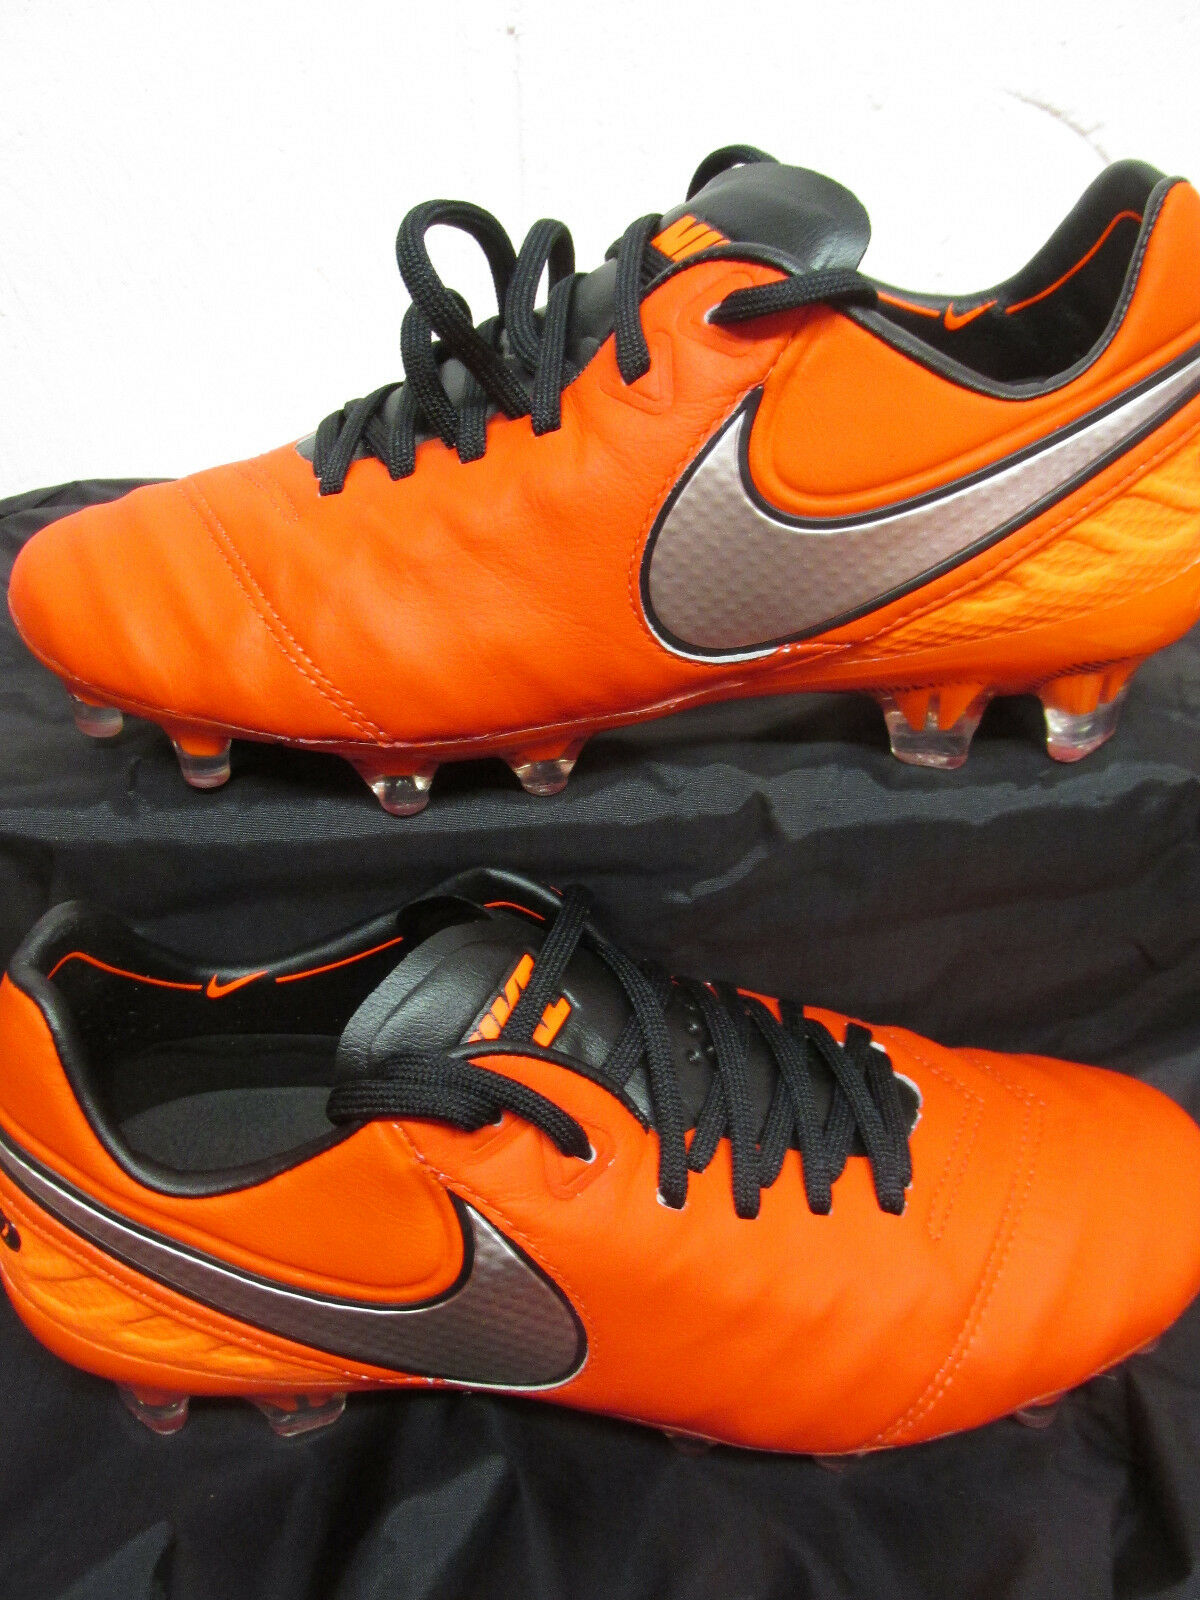 Nike tiempo legend VI FG mens football Stiefel 819177 608 soccer cleats